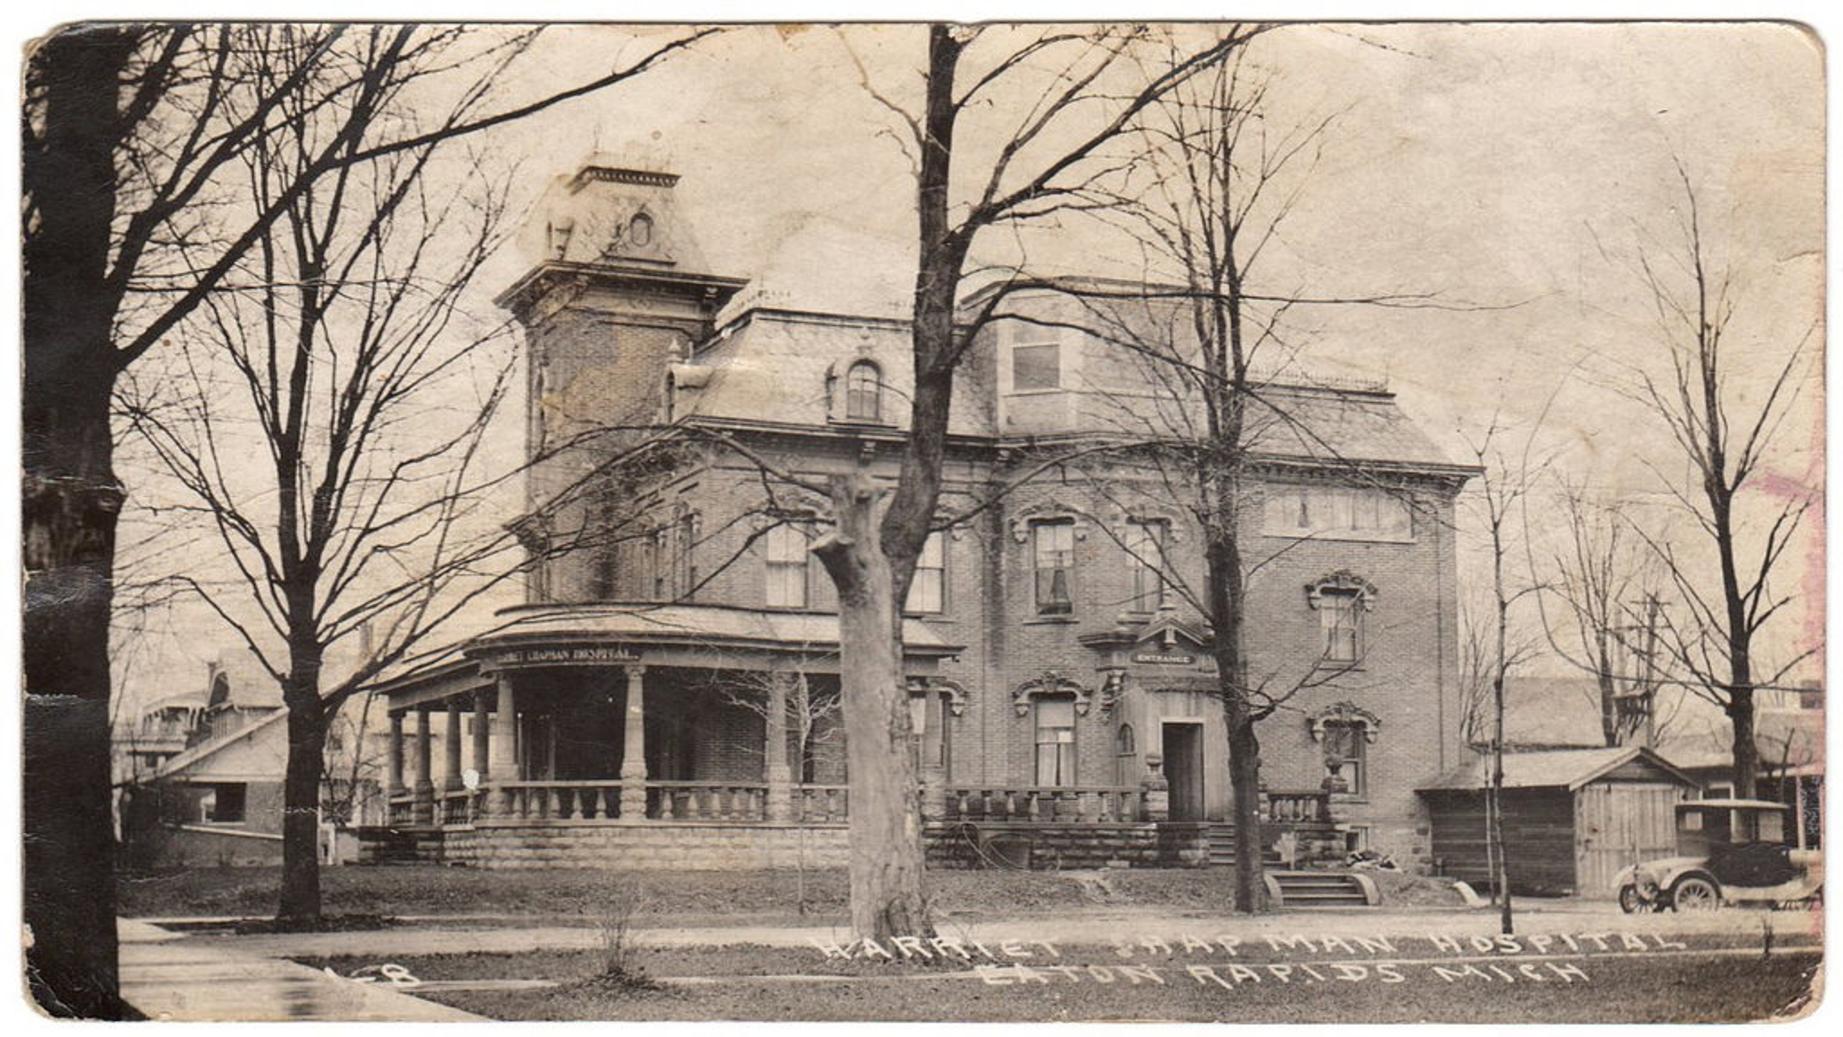 Stimson Hospital Ghost Hunt | Eaton Rapids, Michigan